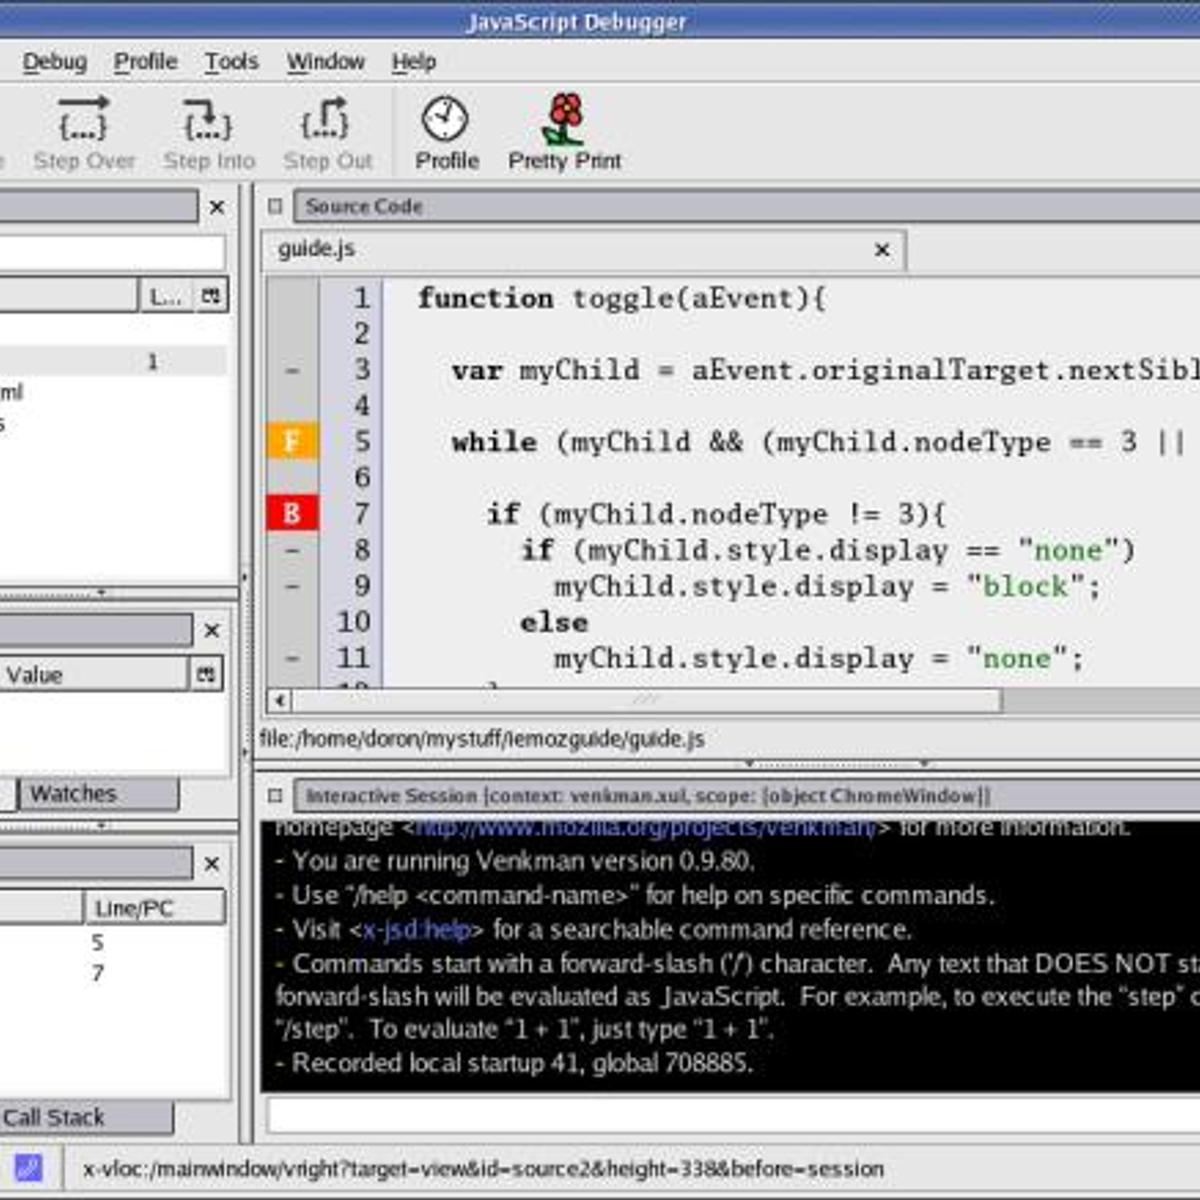 7 Javascript Debugger (Venkman) Alternatives and Similar Software